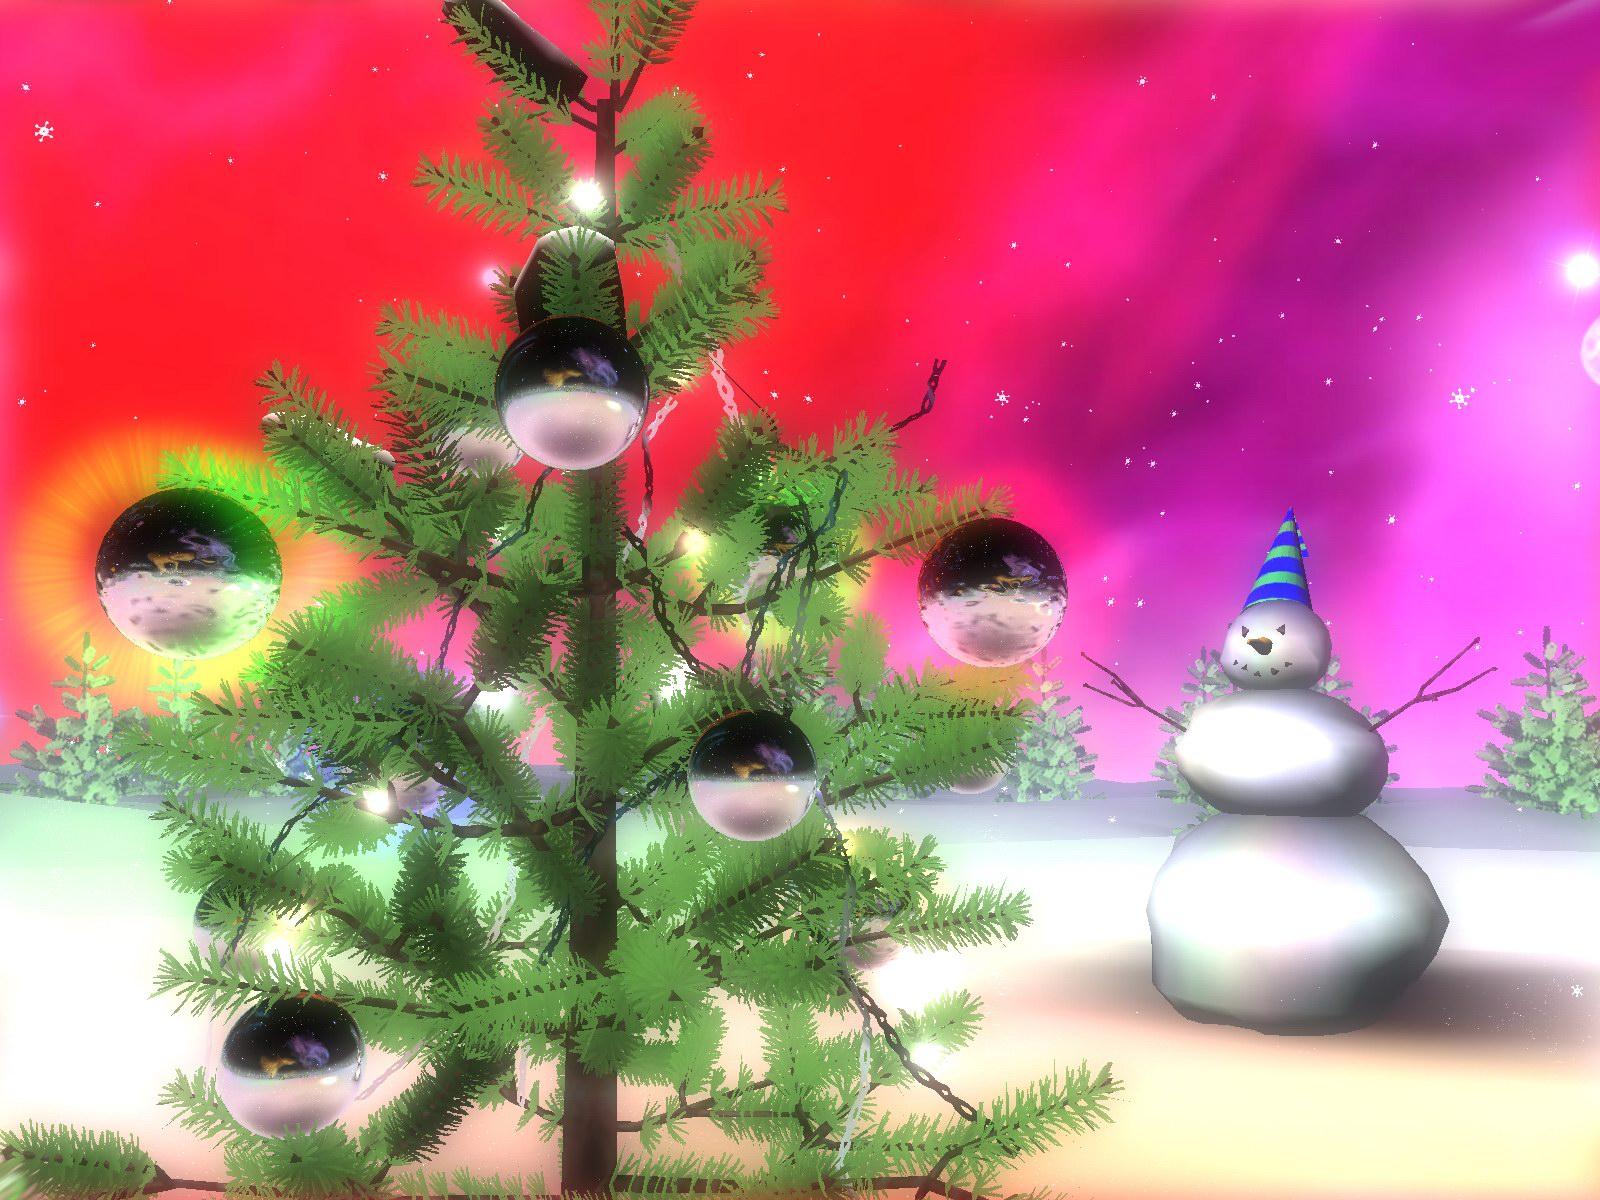 free christmas screensavers 1600x1200